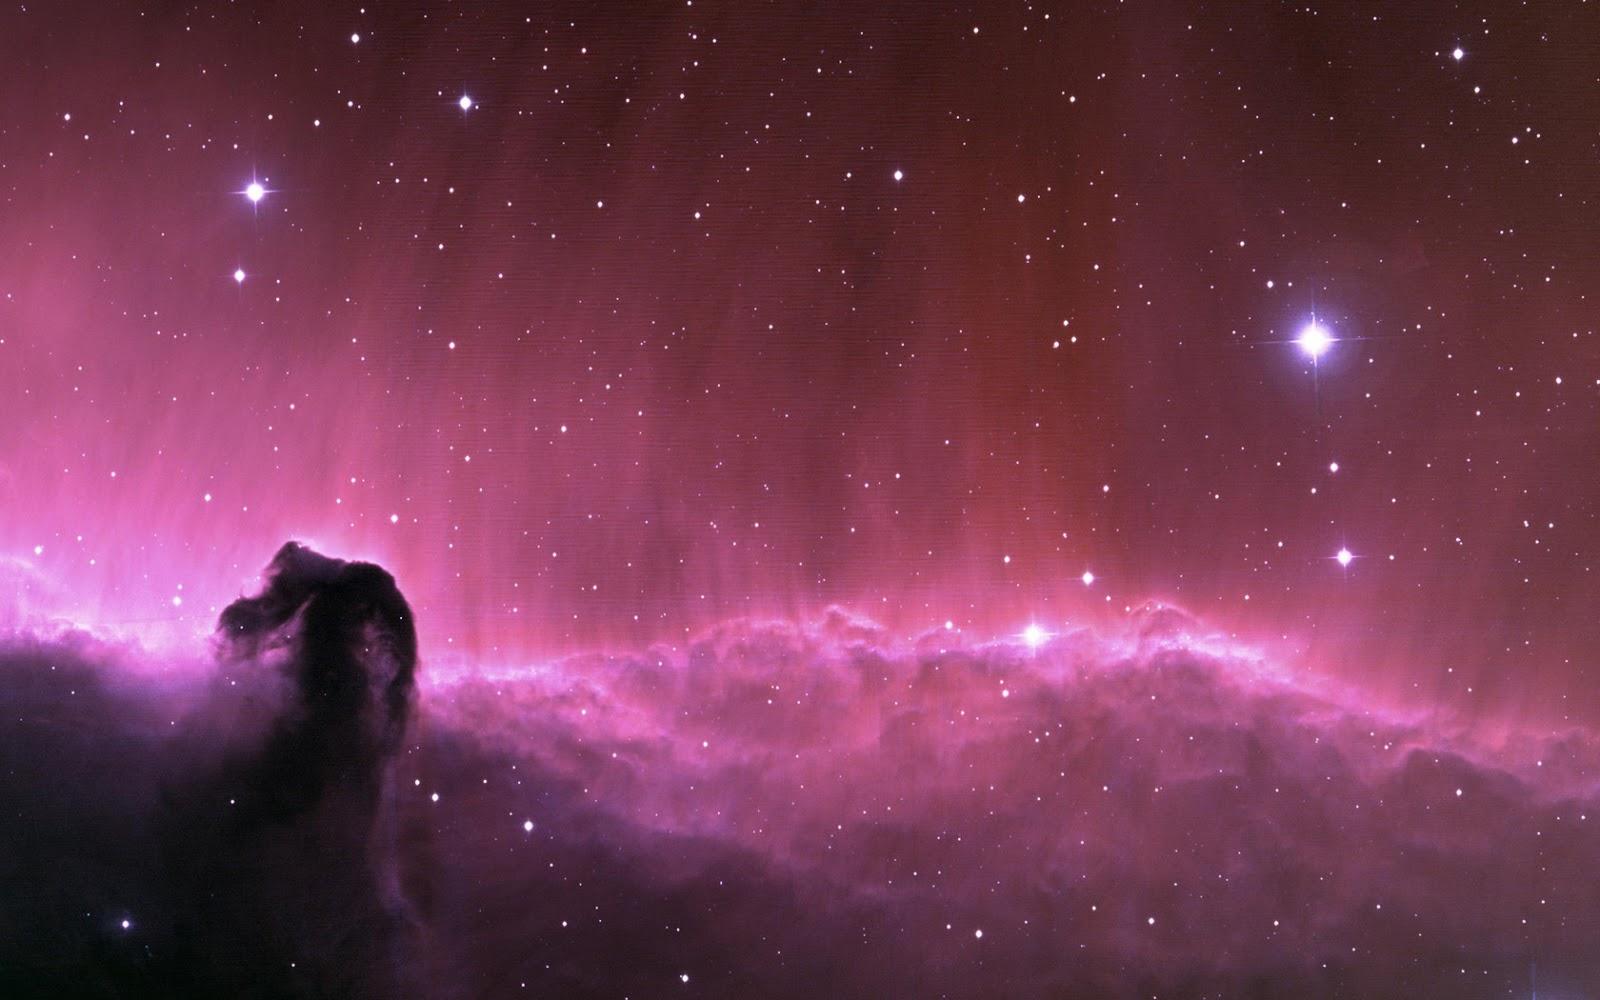 Good   Wallpaper Horse Nebula - Horsehead-Nebula-Wallpaper-HD-20  You Should Have_152118.jpg